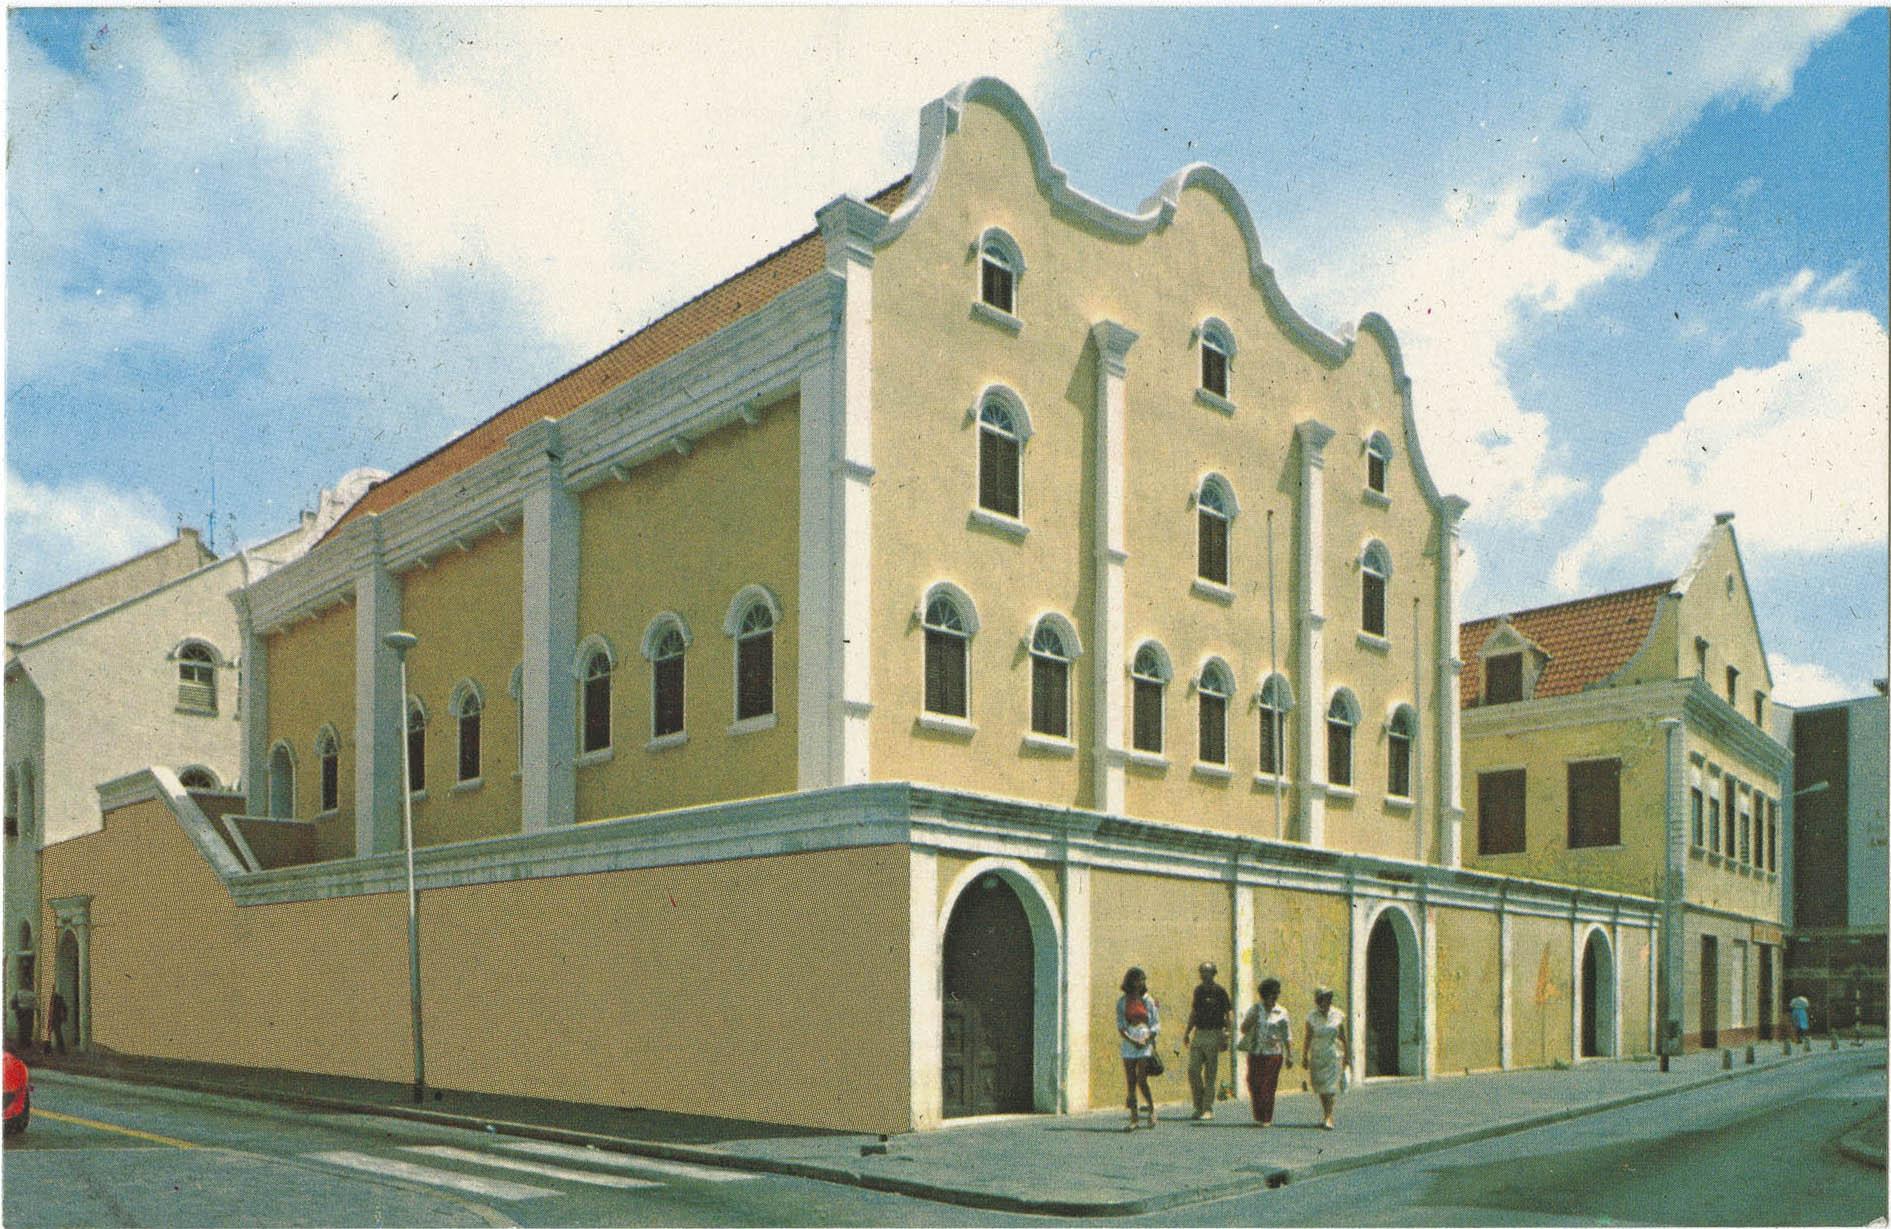 Curacao, Netherlands Antilles. Synagogue Mikve Israel-Emanuel - dedicated in 1732 - oldest in the Western Hemisphere.